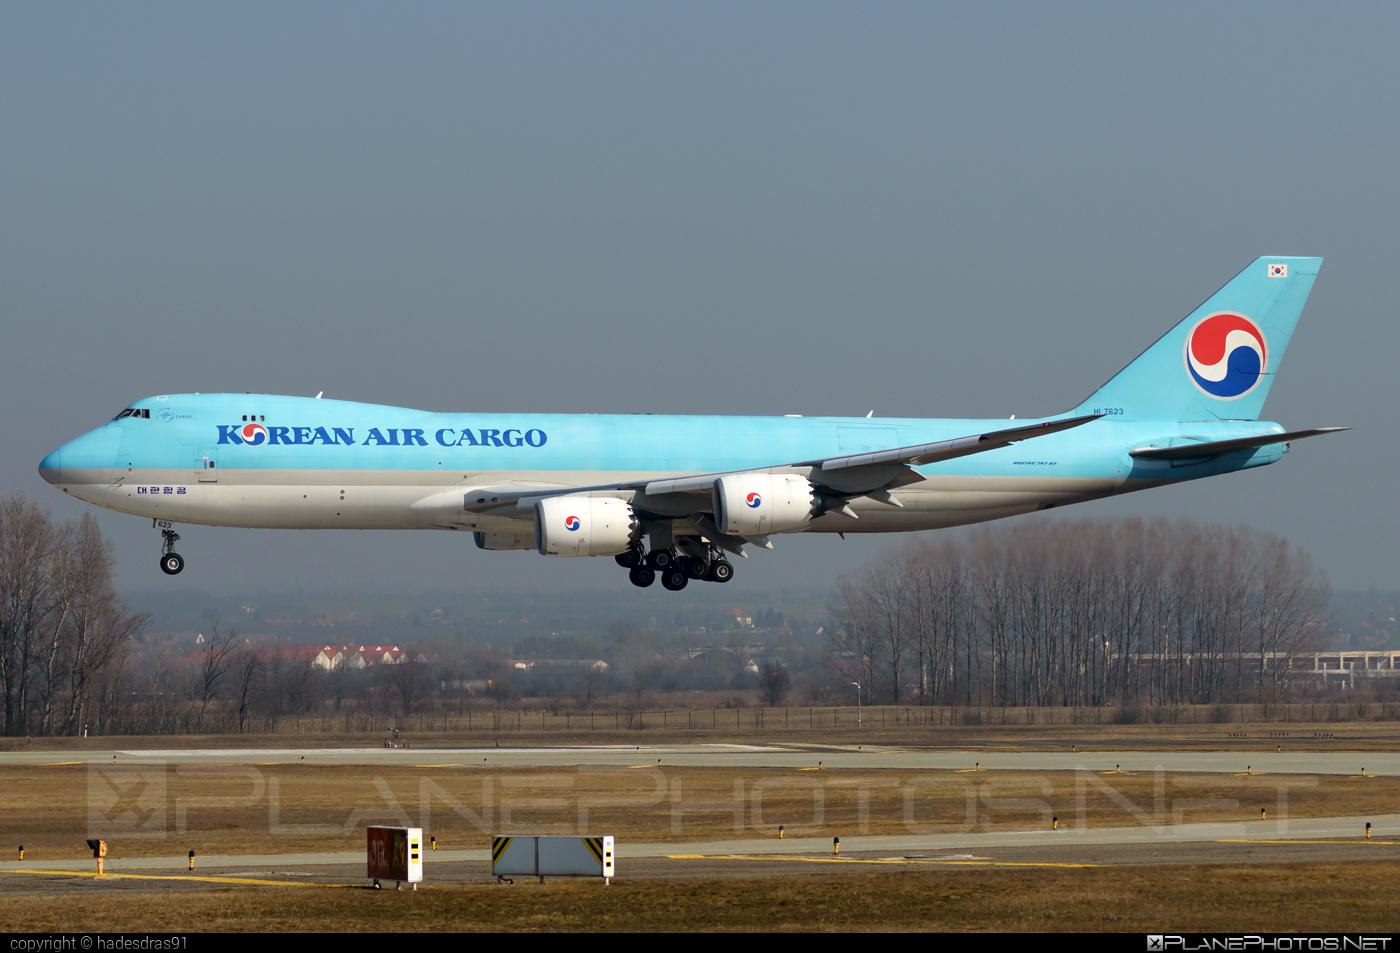 Boeing 747-8F - HL7623 operated by Korean Air Cargo #b747 #b747f #b747freighter #boeing #boeing747 #jumbo #koreanair #koreanaircargo